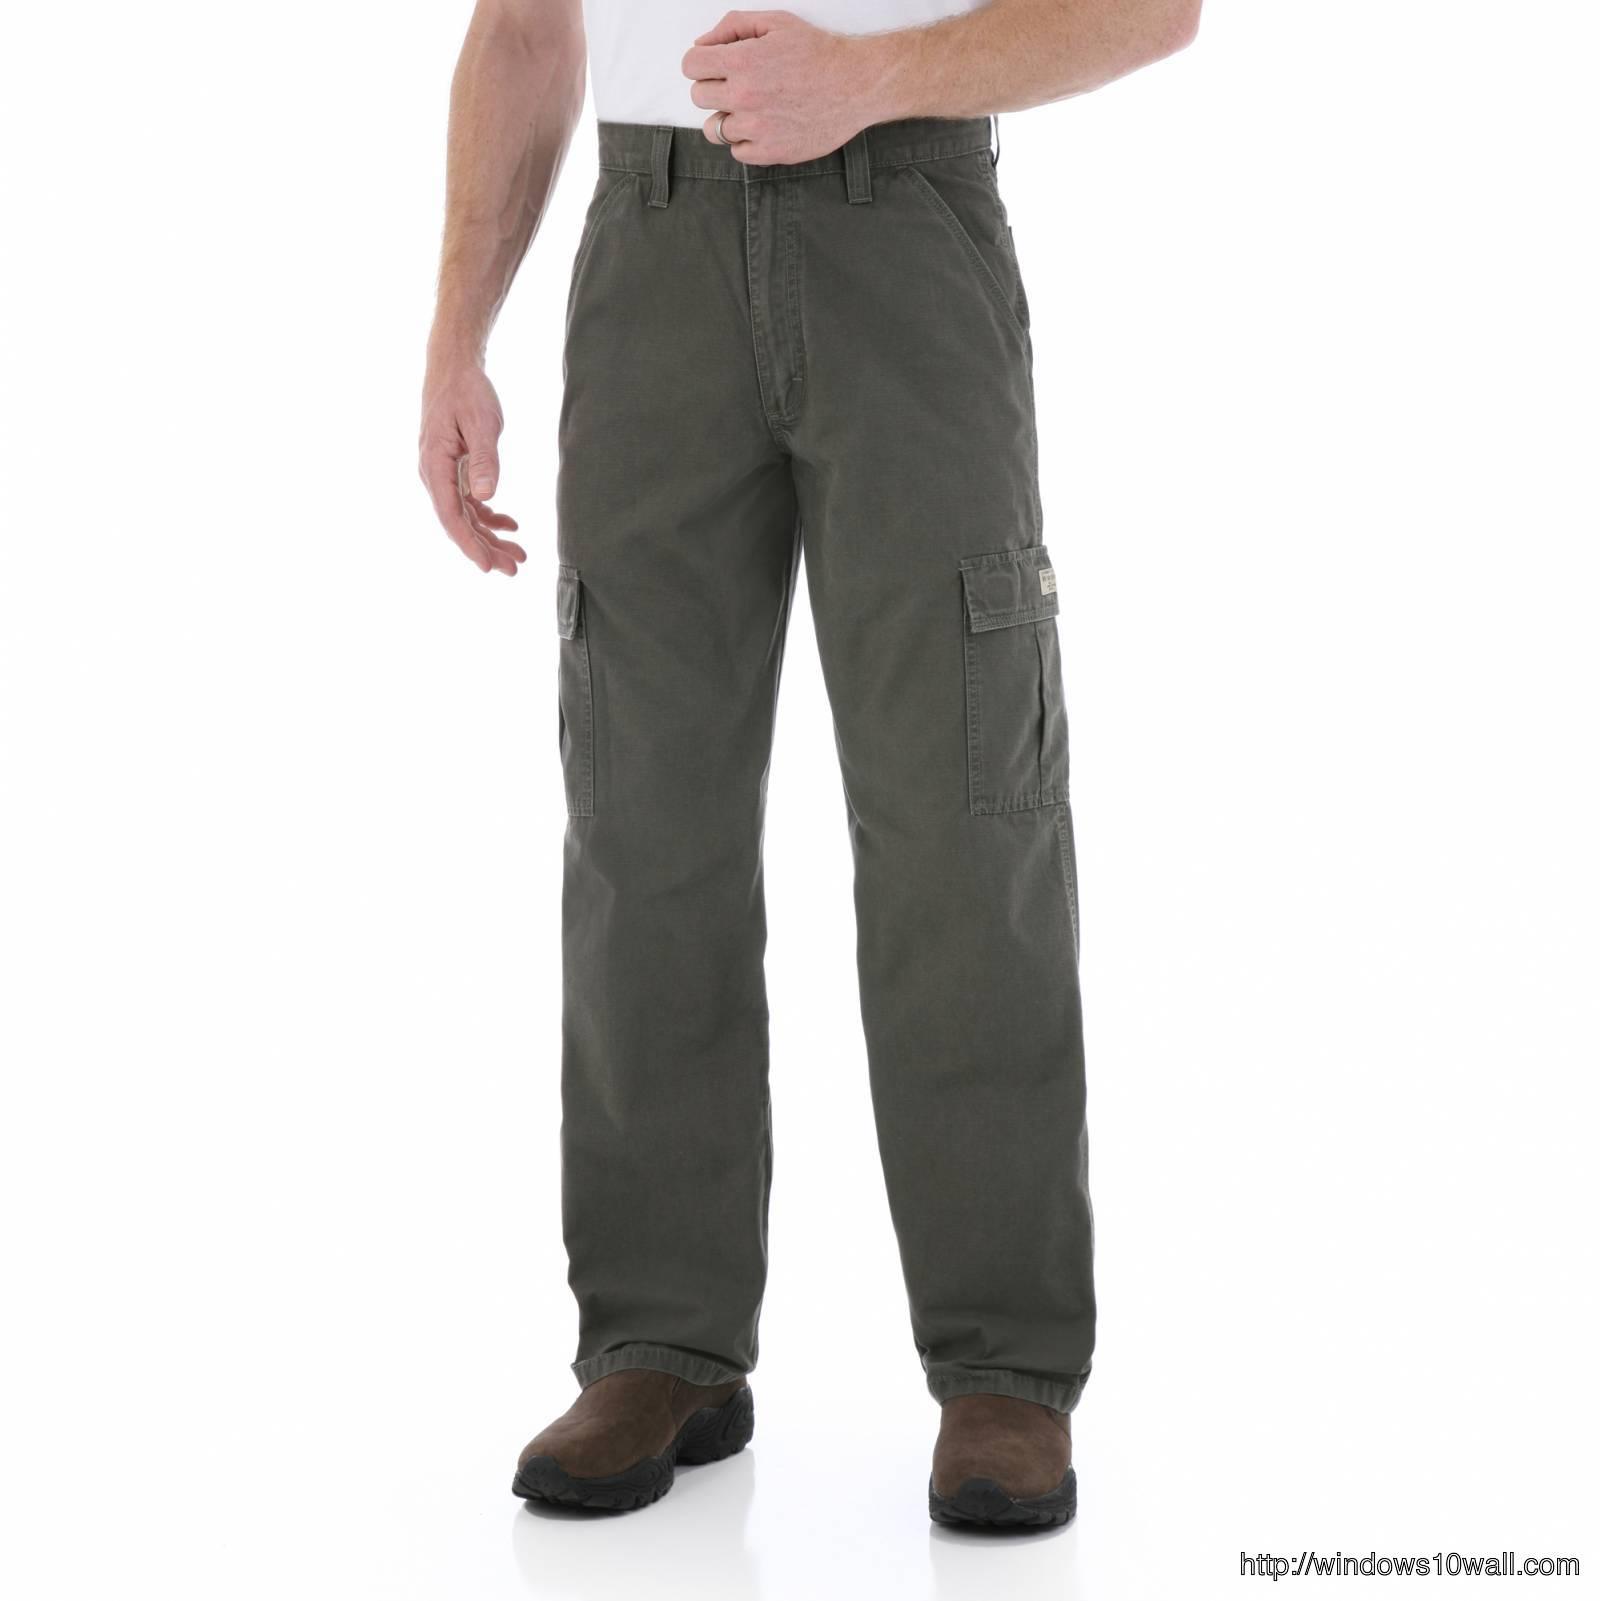 cargo-pants-for-men-background-wallpaper